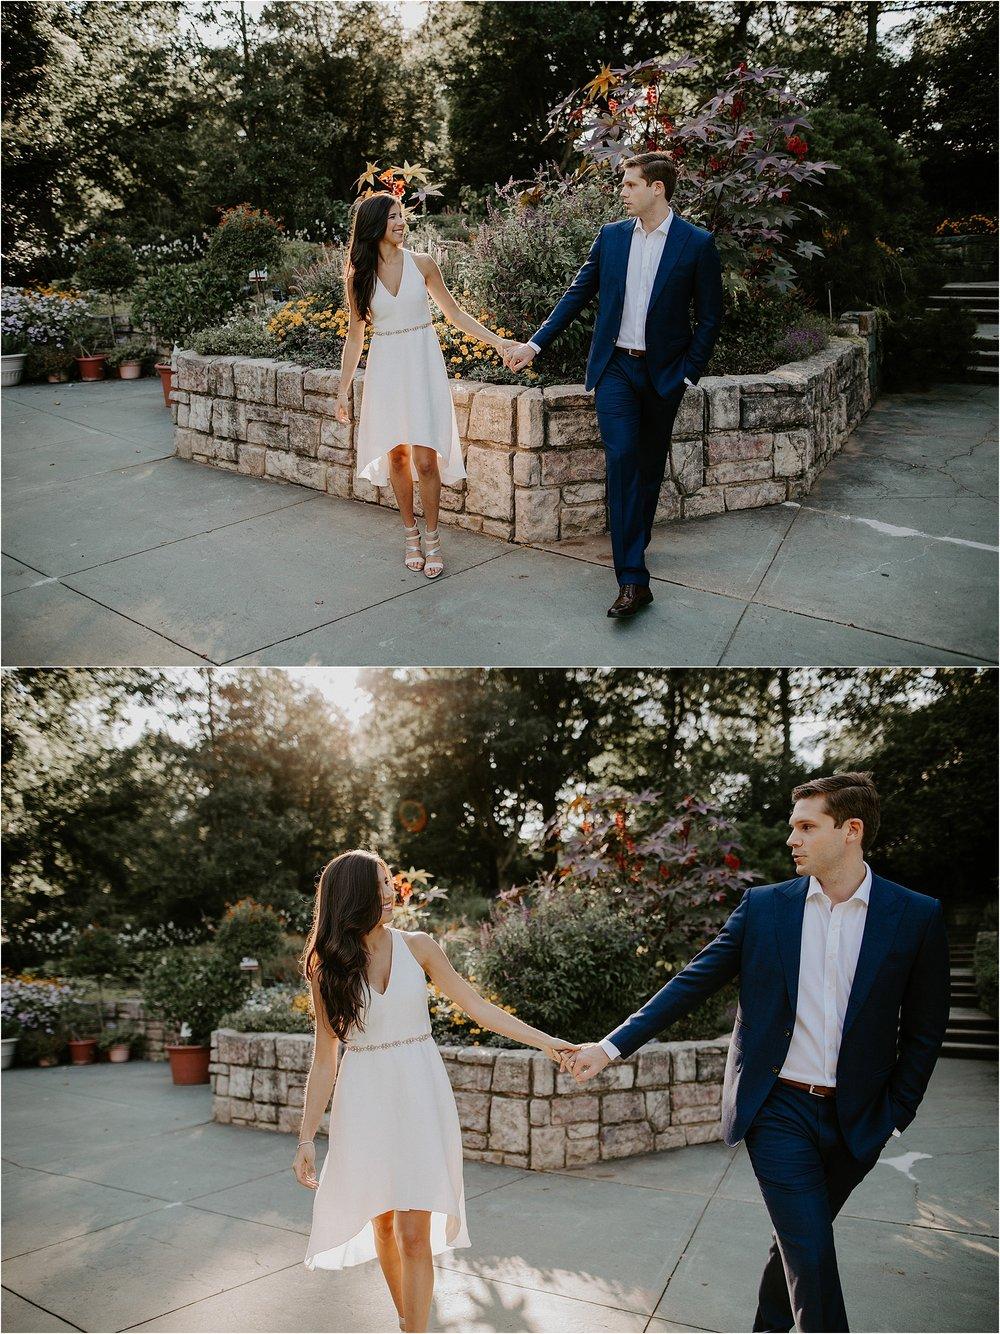 Sarah_Brookhart_Baltimore_Wedding_Photographer_0004.jpg